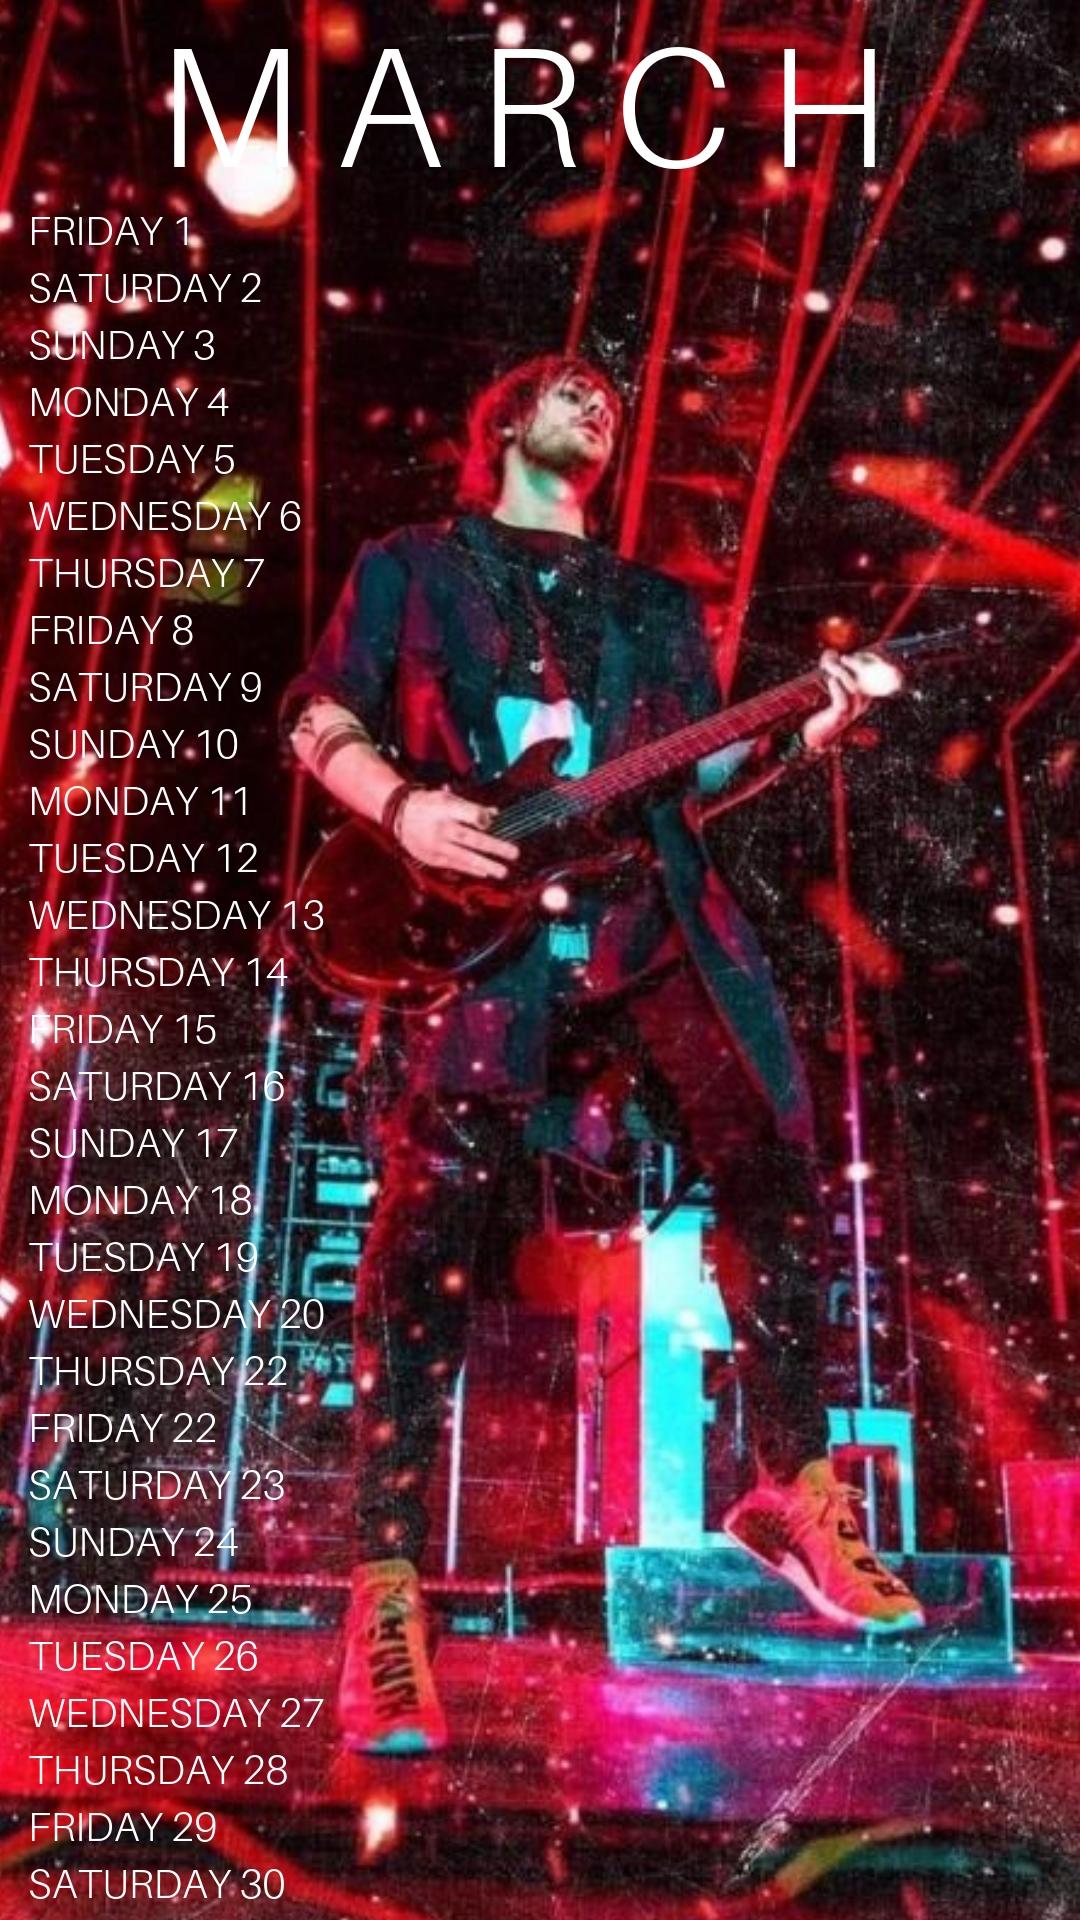 5Sos Calendars | Tumblr 5Sos Calendar 2019